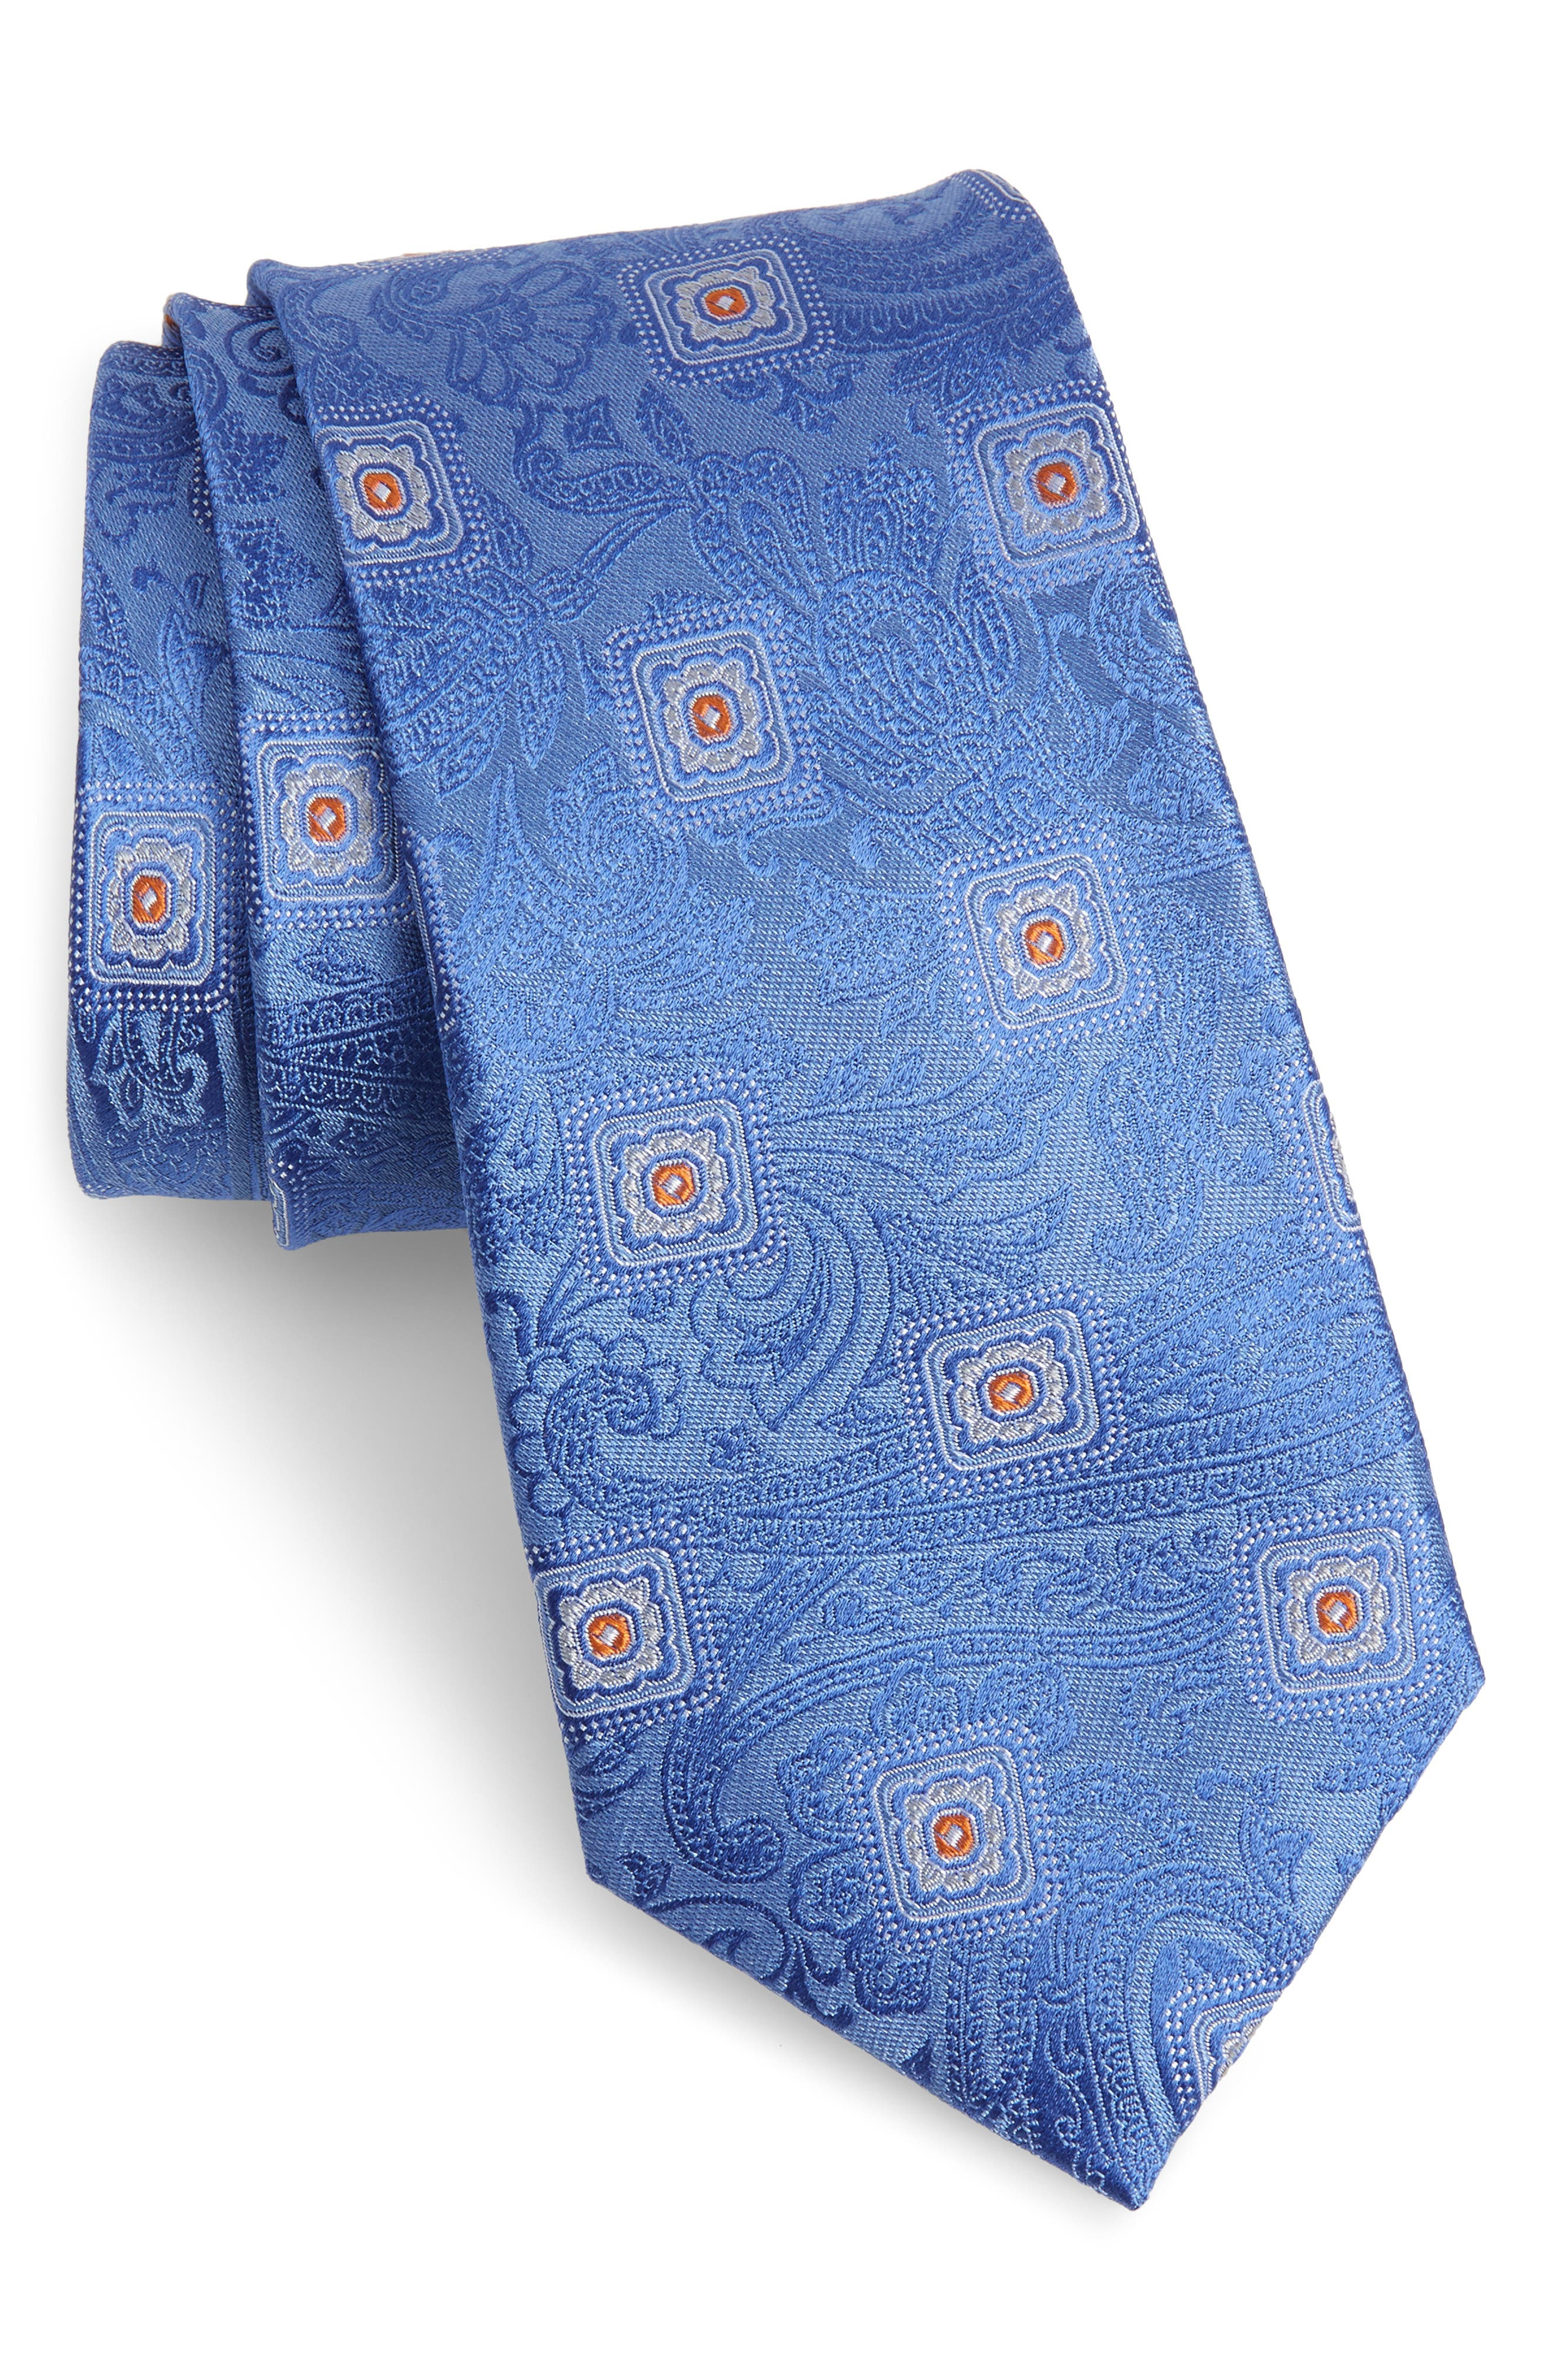 Baird Medallion Silk Tie,                             Main thumbnail 1, color,                             BLUE